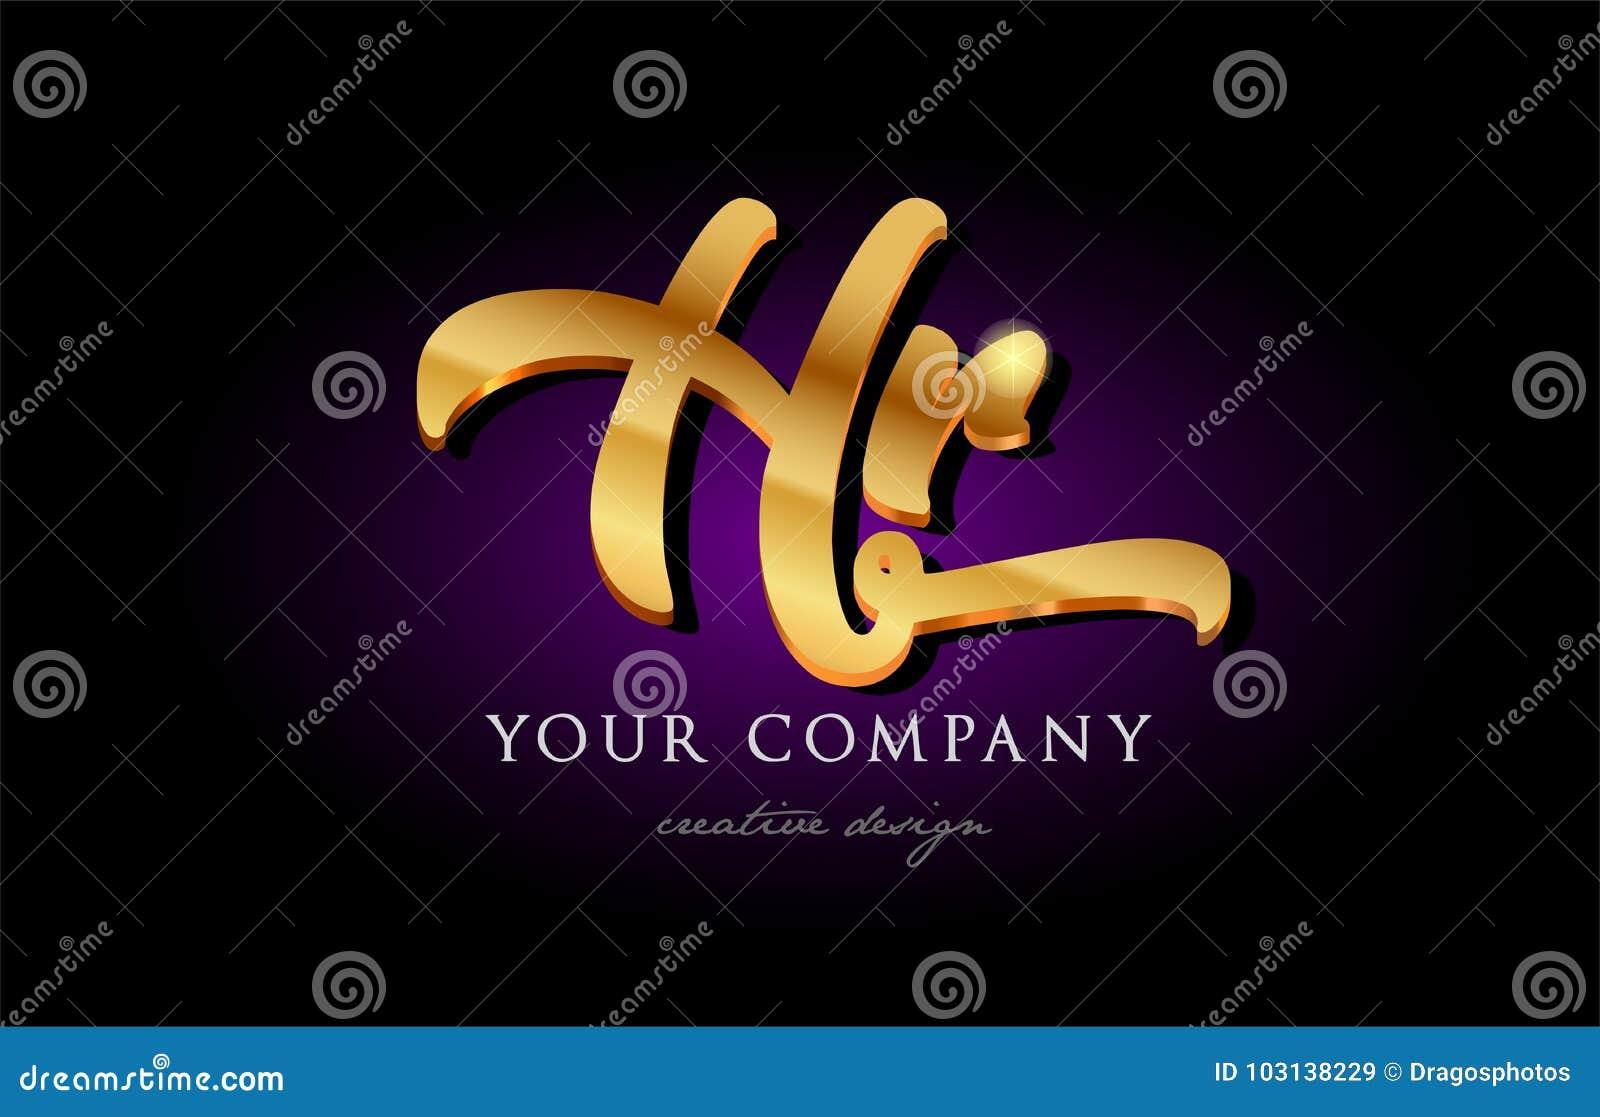 Hr H R 3d Gold Golden Alphabet Letter Metal Logo Icon Design H Stock